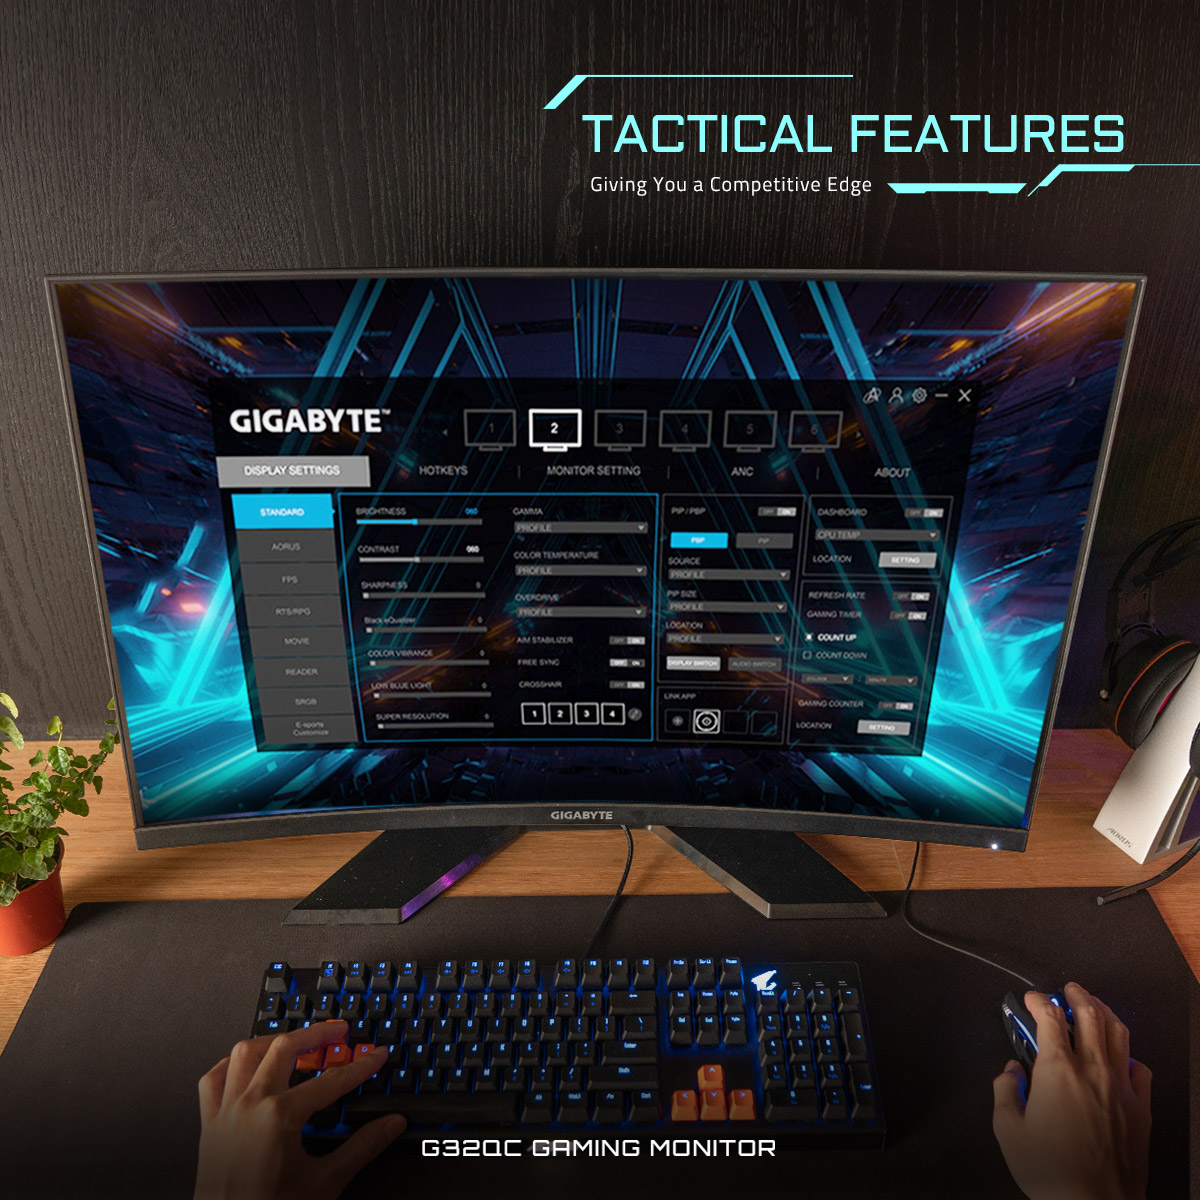 GIGABYTE G32QC Gaming Monitor - Giving you a competitive Edge!  https://www.gigabyte.com/Monitor/G32QC#kf…   #JoinTheFight #gigabytemonitor #gamingmonitor #G32QC #curvedmonitor #monitor #curved #gaming #monitors #InstaGaming #InstaGamers #InstaGame #aorus #gamingcomputer #gamingpcbuilds #pcpartspic.twitter.com/RmkH7yaB8S